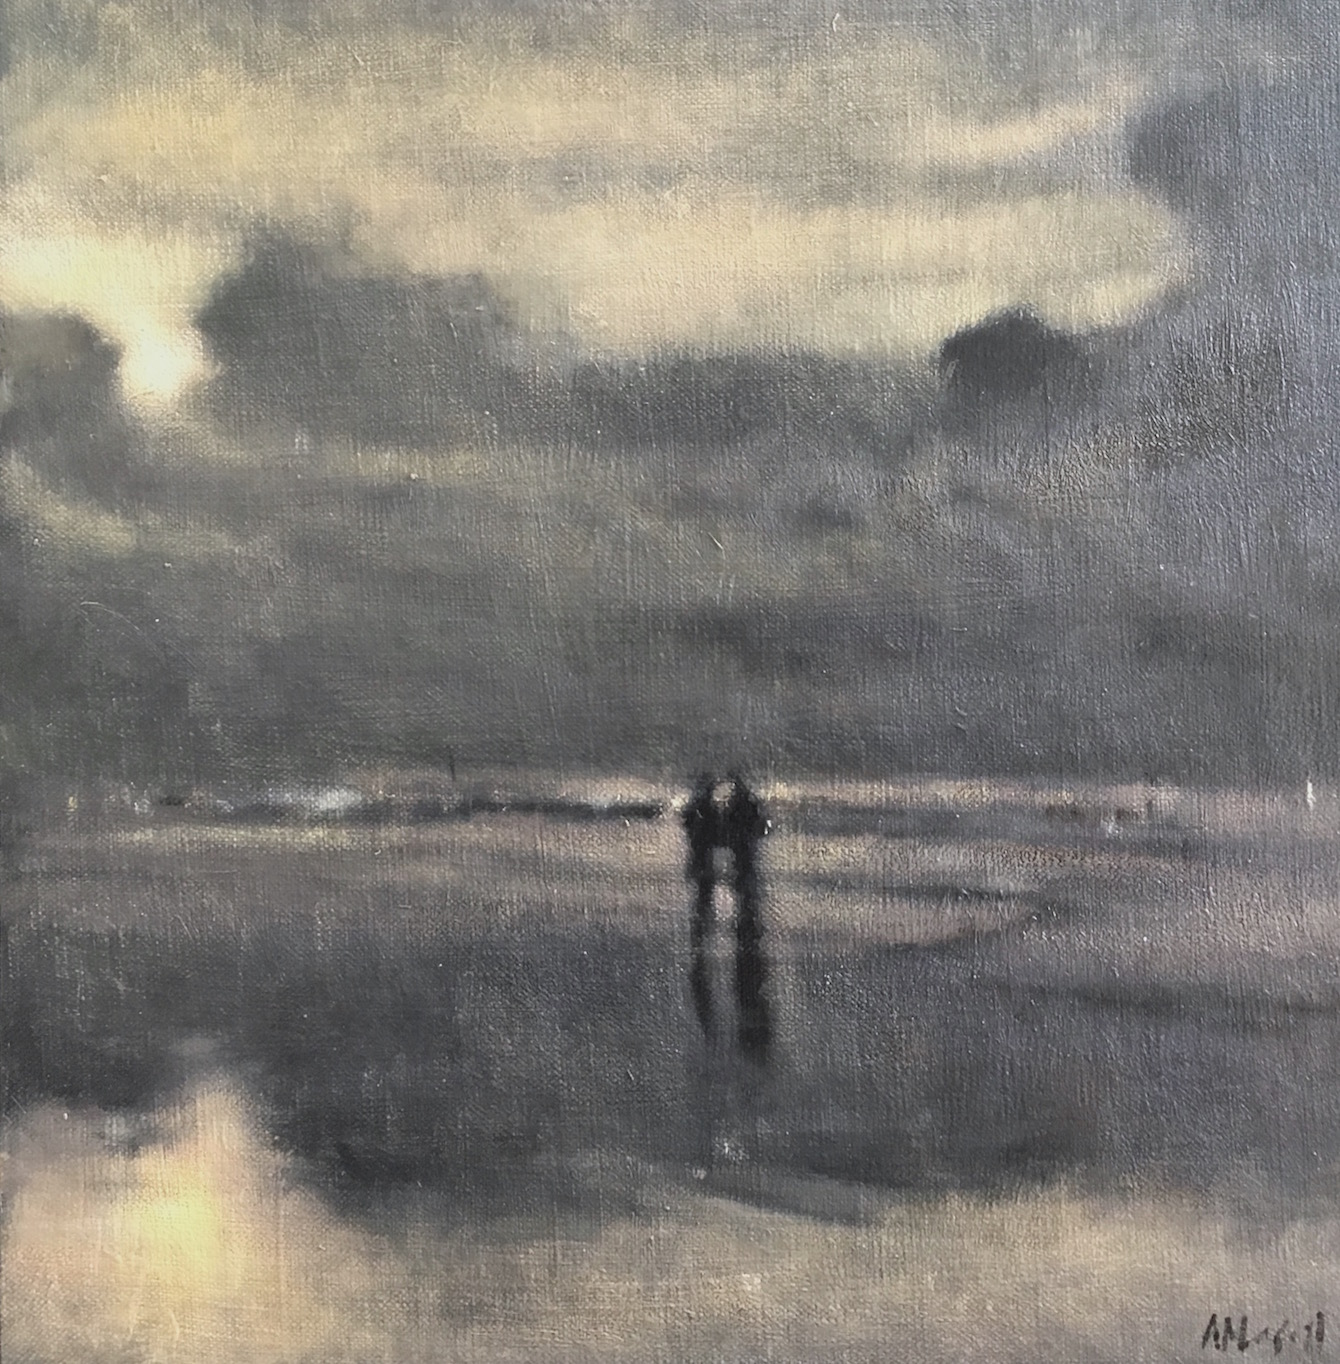 Artist: Anne Magill  Title: A Walk  Medium: Acrylic on canvas  Size: 30 x 30 cm  Price: £7950